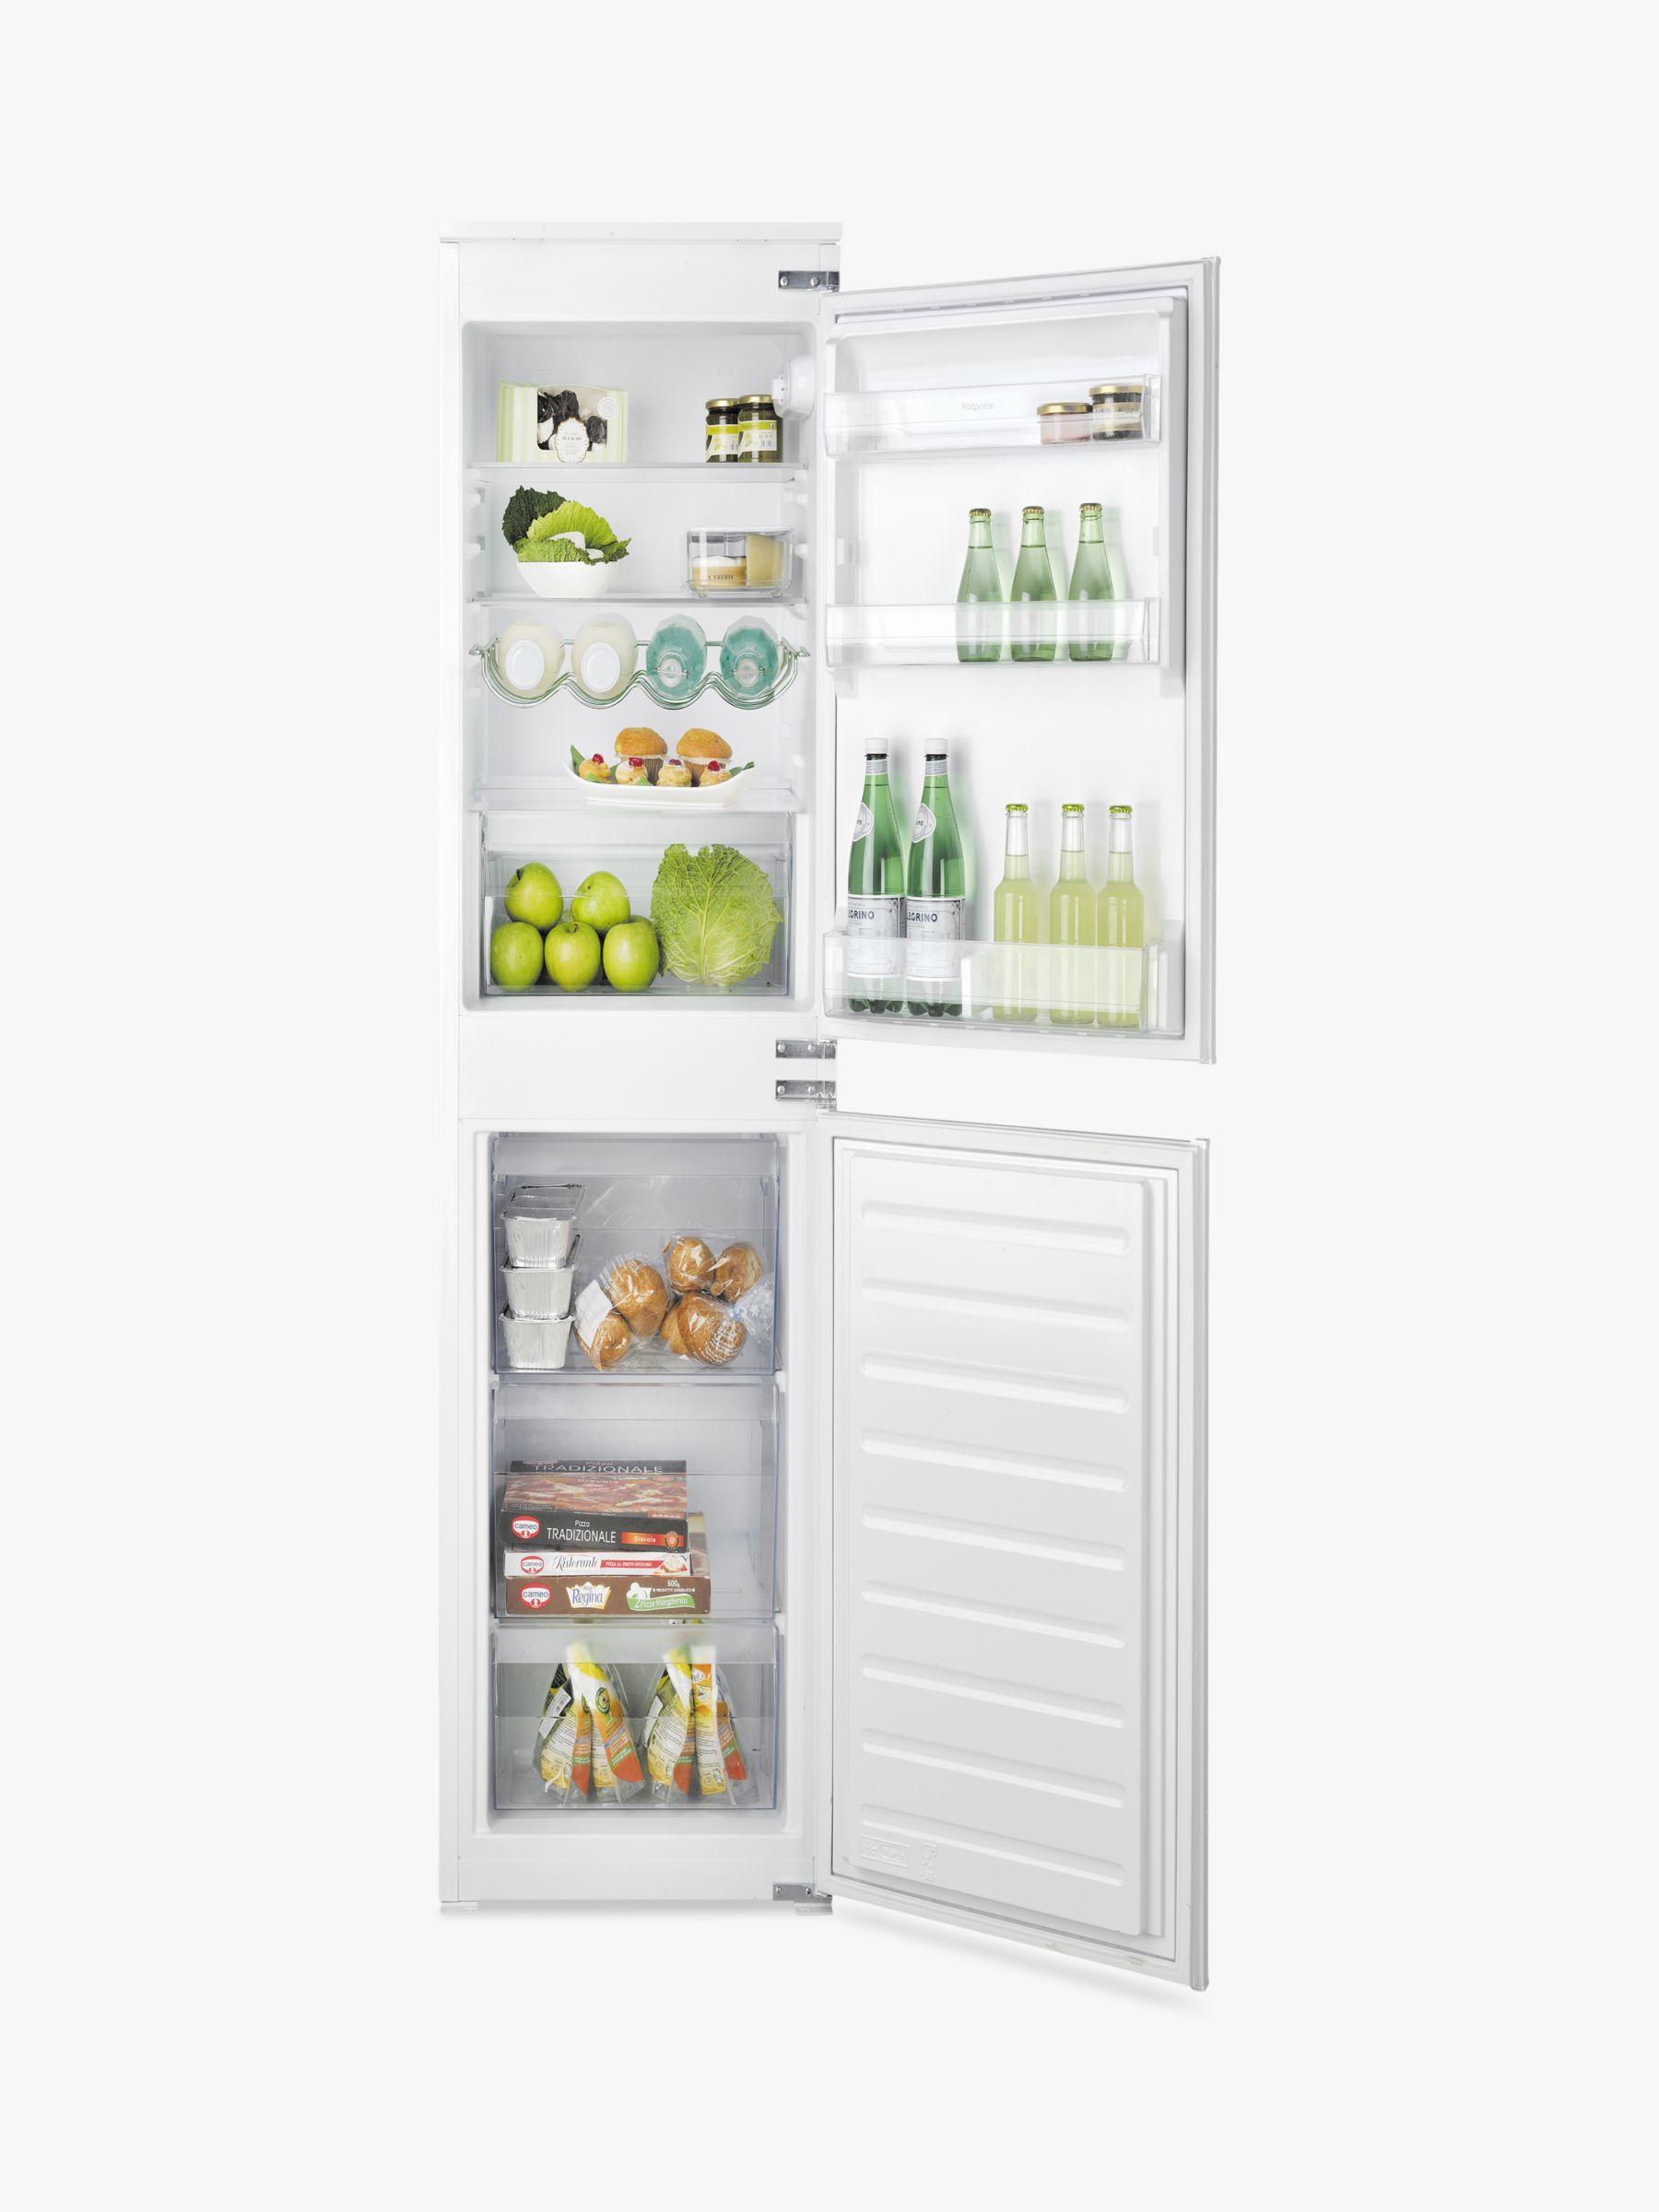 Hotpoint Hotpoint HMCB50501AA.UK Aquarius Integrated Fridge Freezer, A+ Energy Rating, 54cm Wide, White